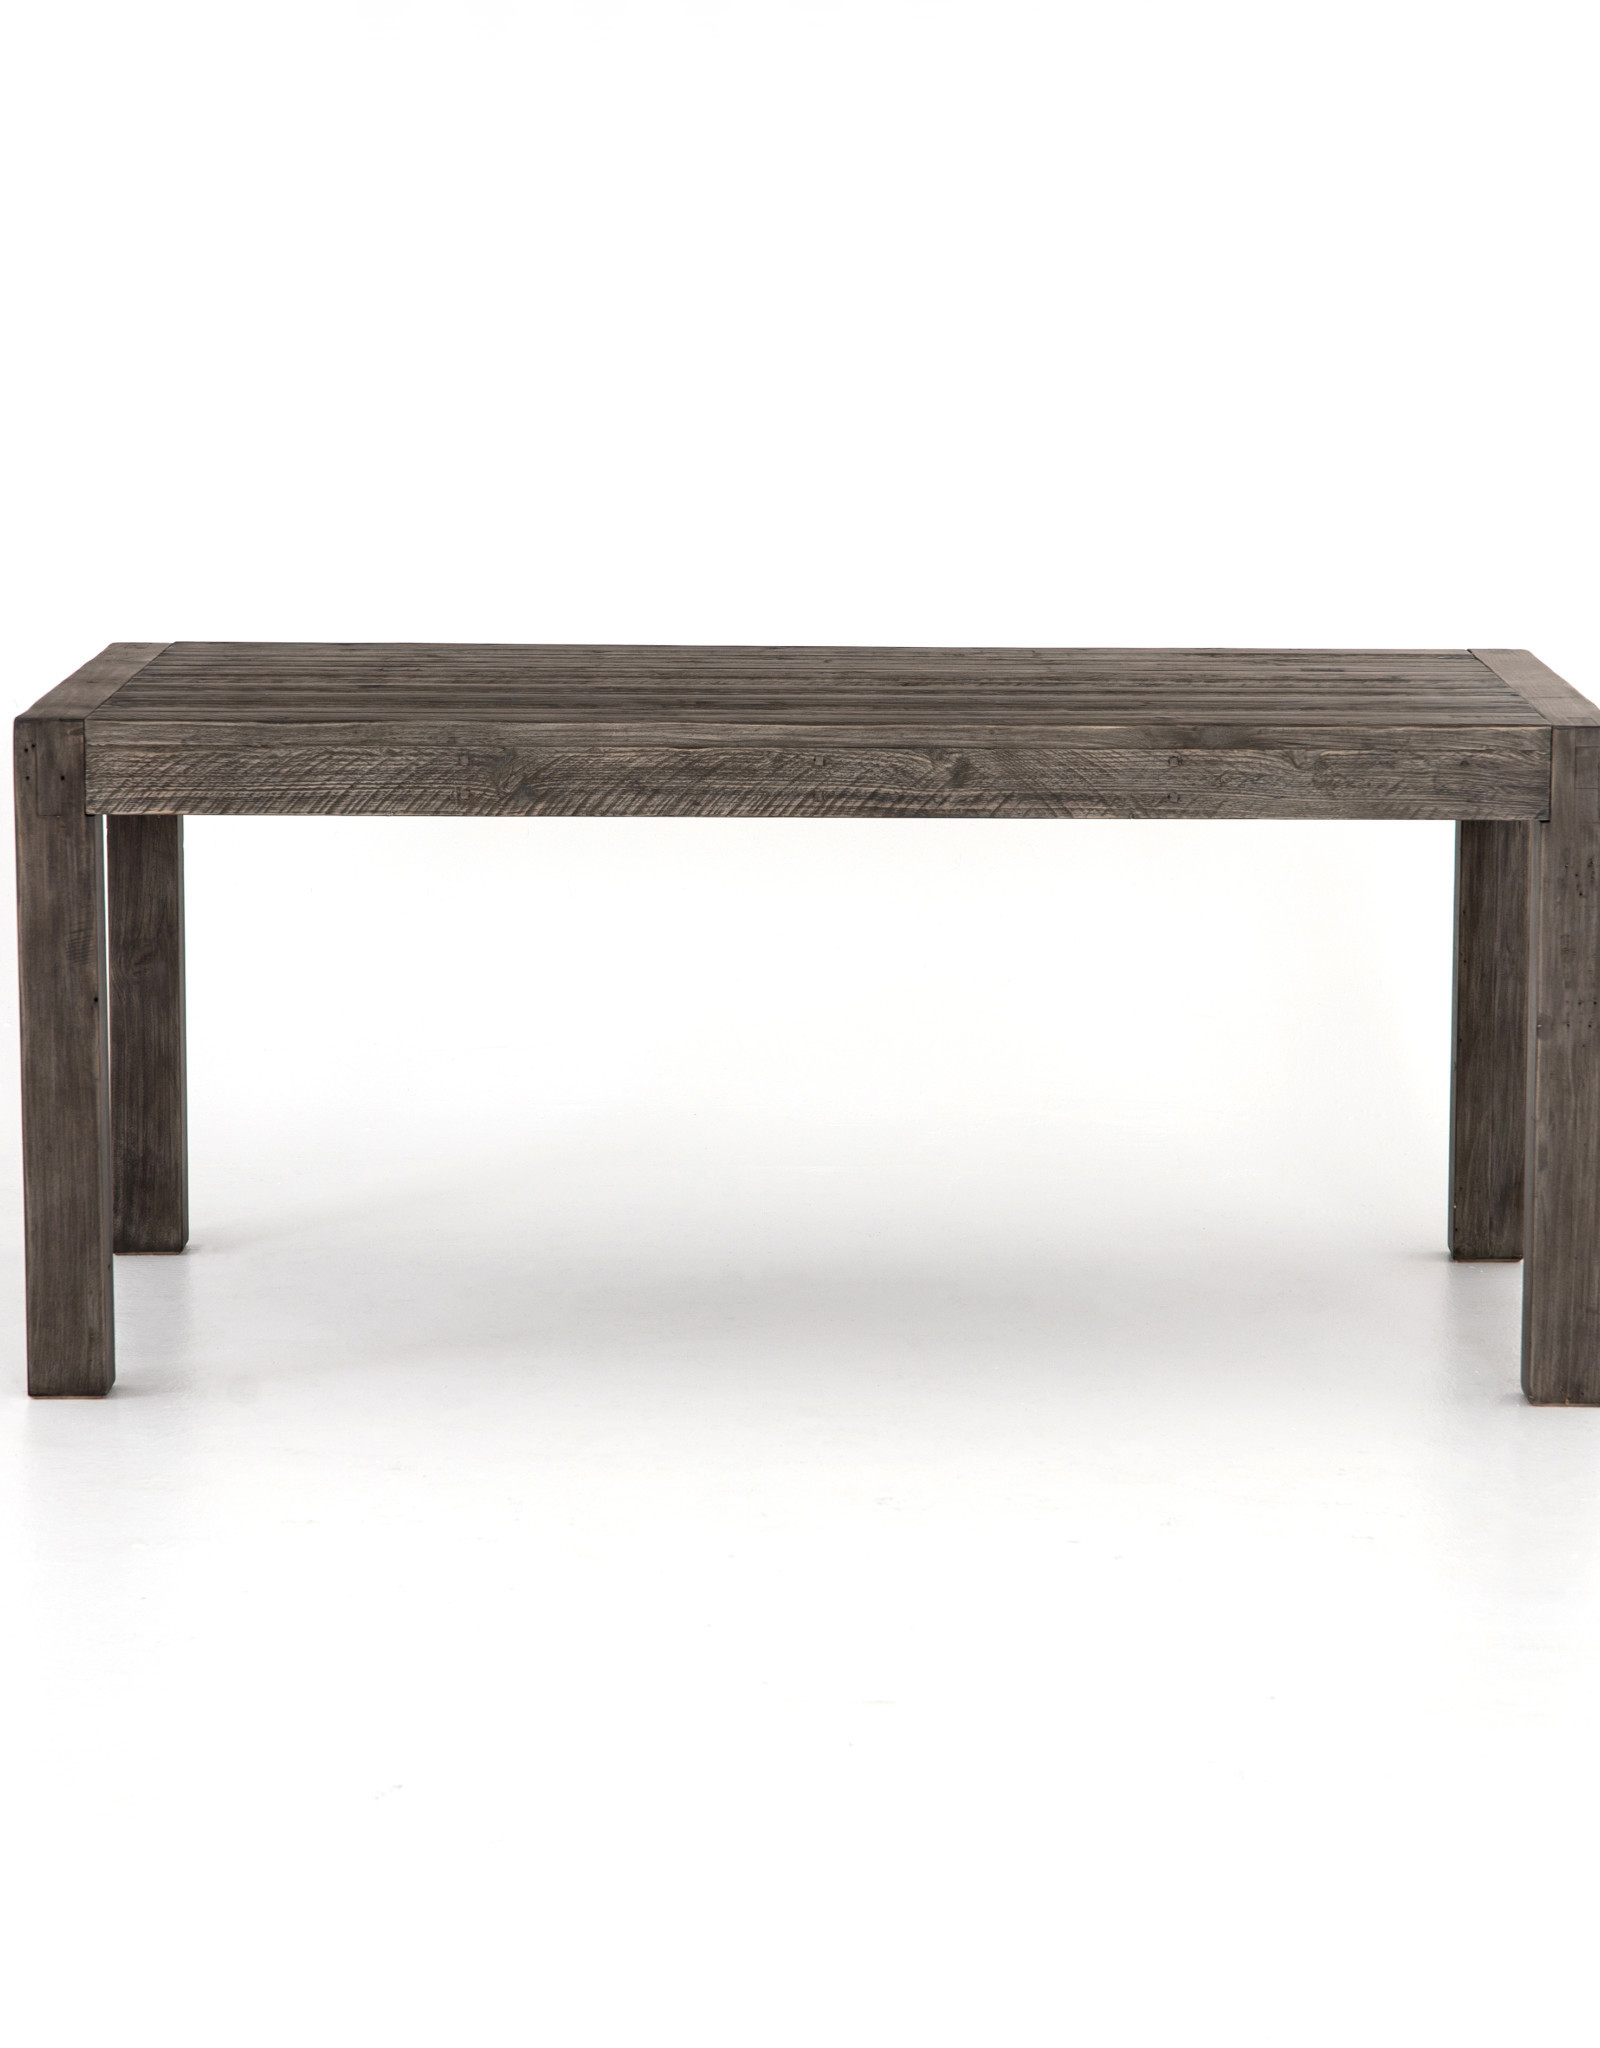 Greywash Rustic Dining Table